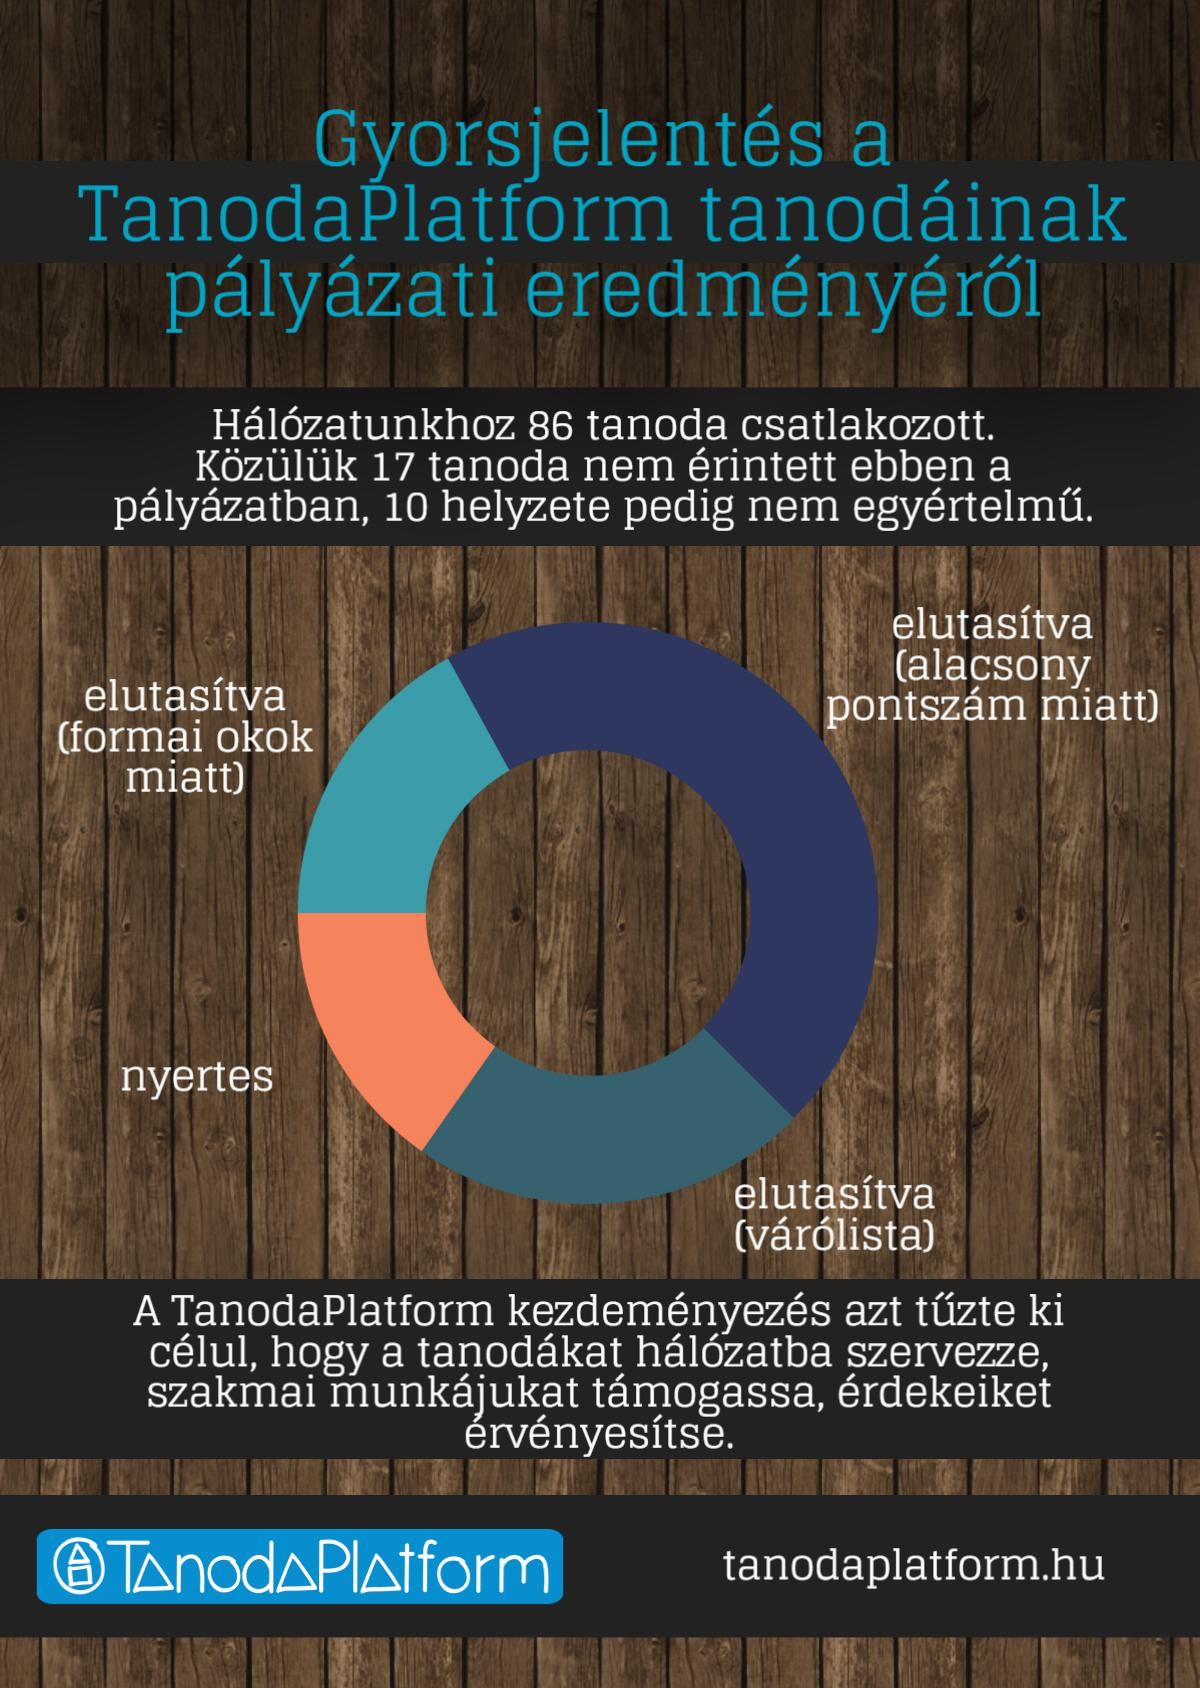 tanodapalyazat_eredmenyek1